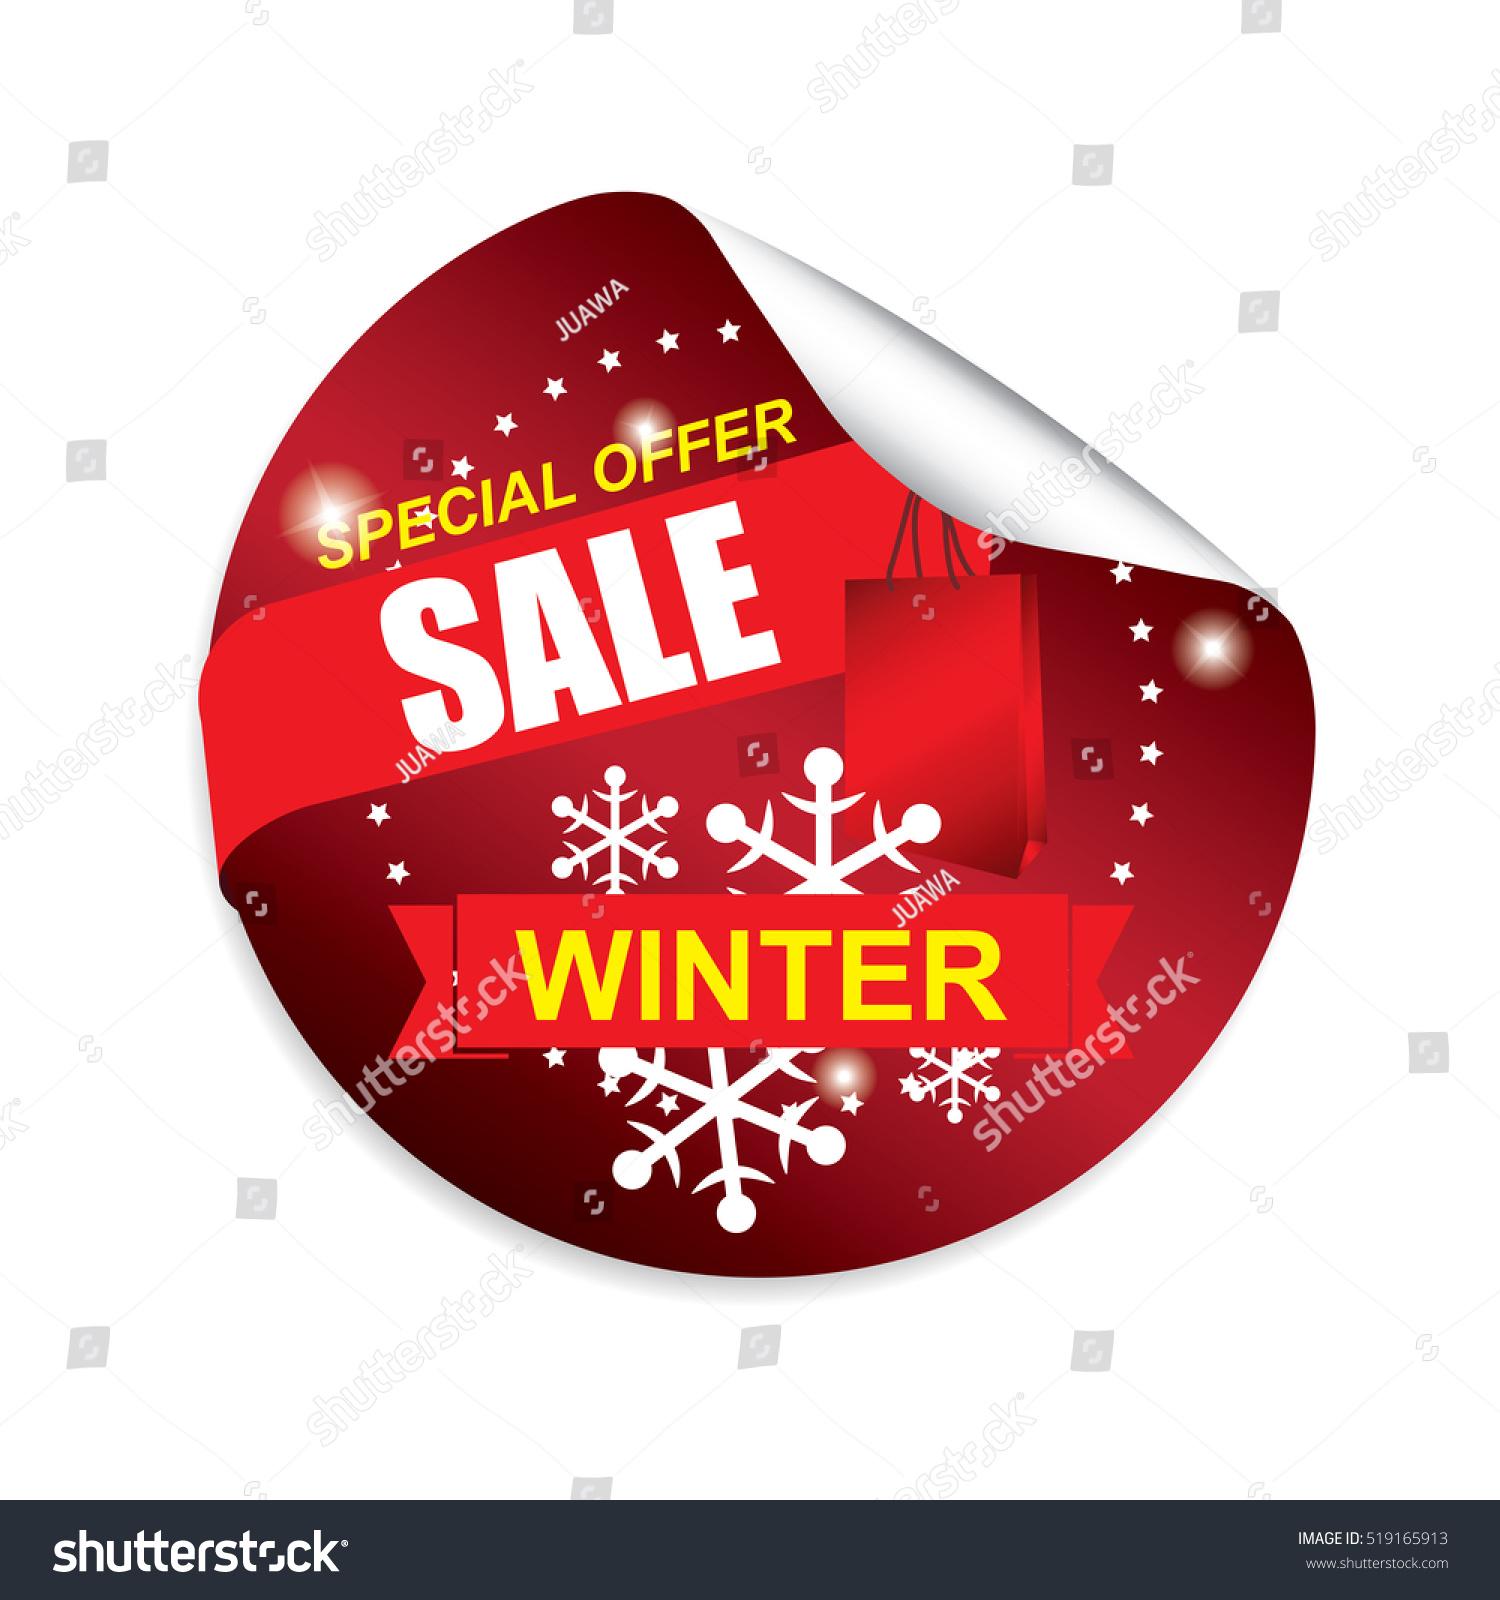 winter sale red sticker button label stock illustration